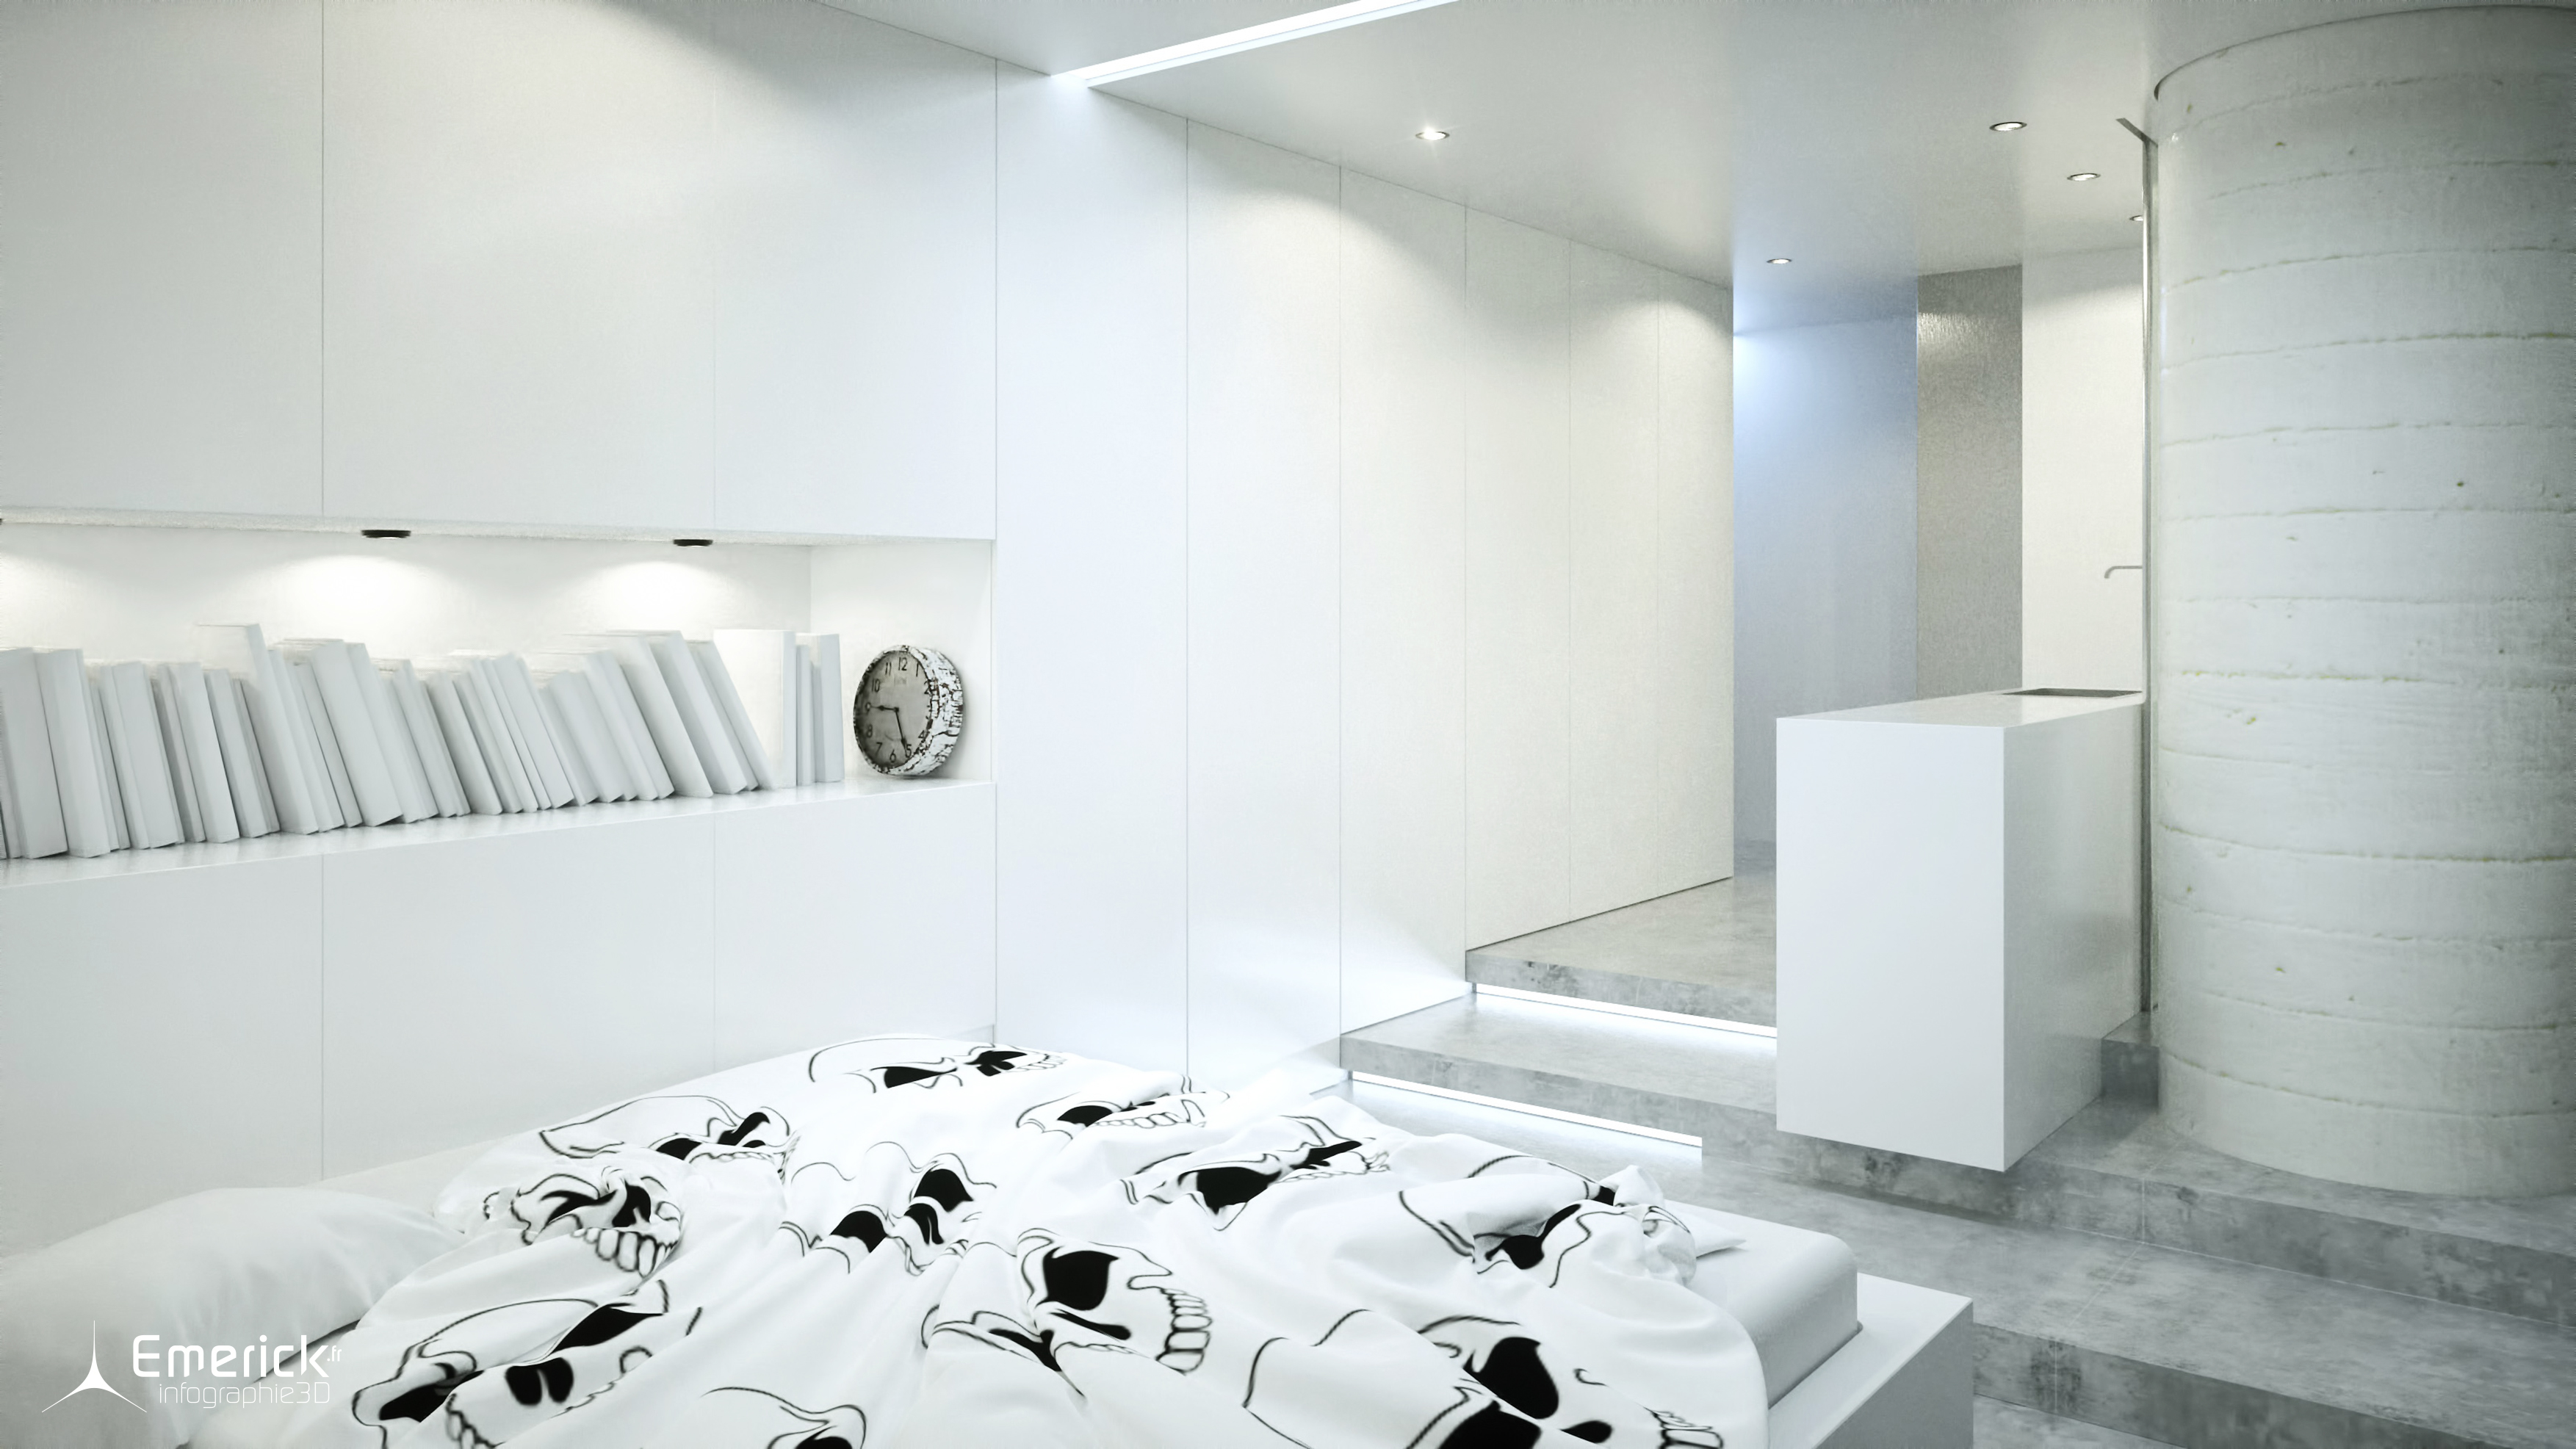 Résidence Yolles (Architecte : J-Chou)